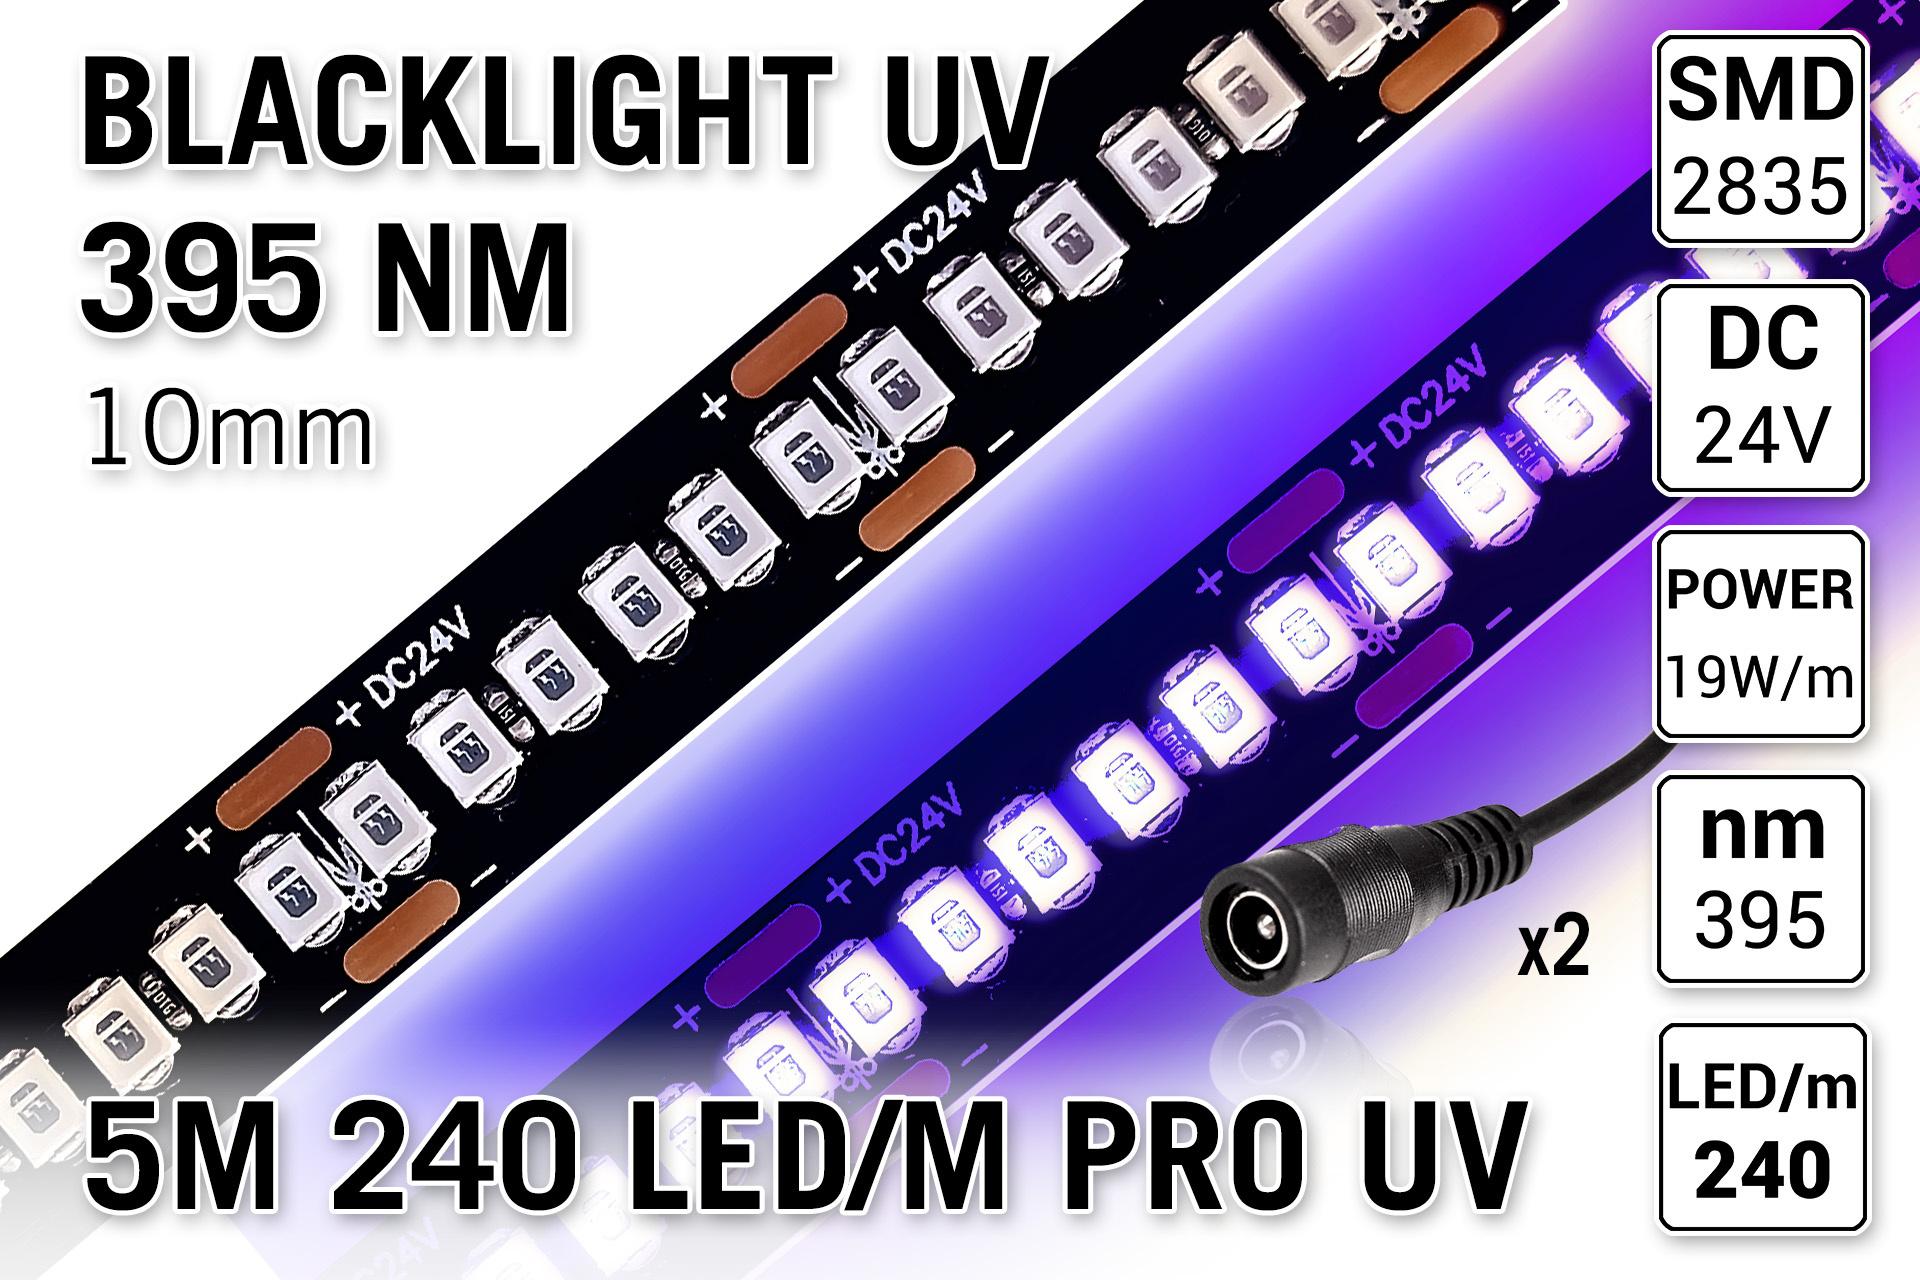 24V UV-A Blacklight LED strip | 395nm | 5M 240LED/m 20W/p.m